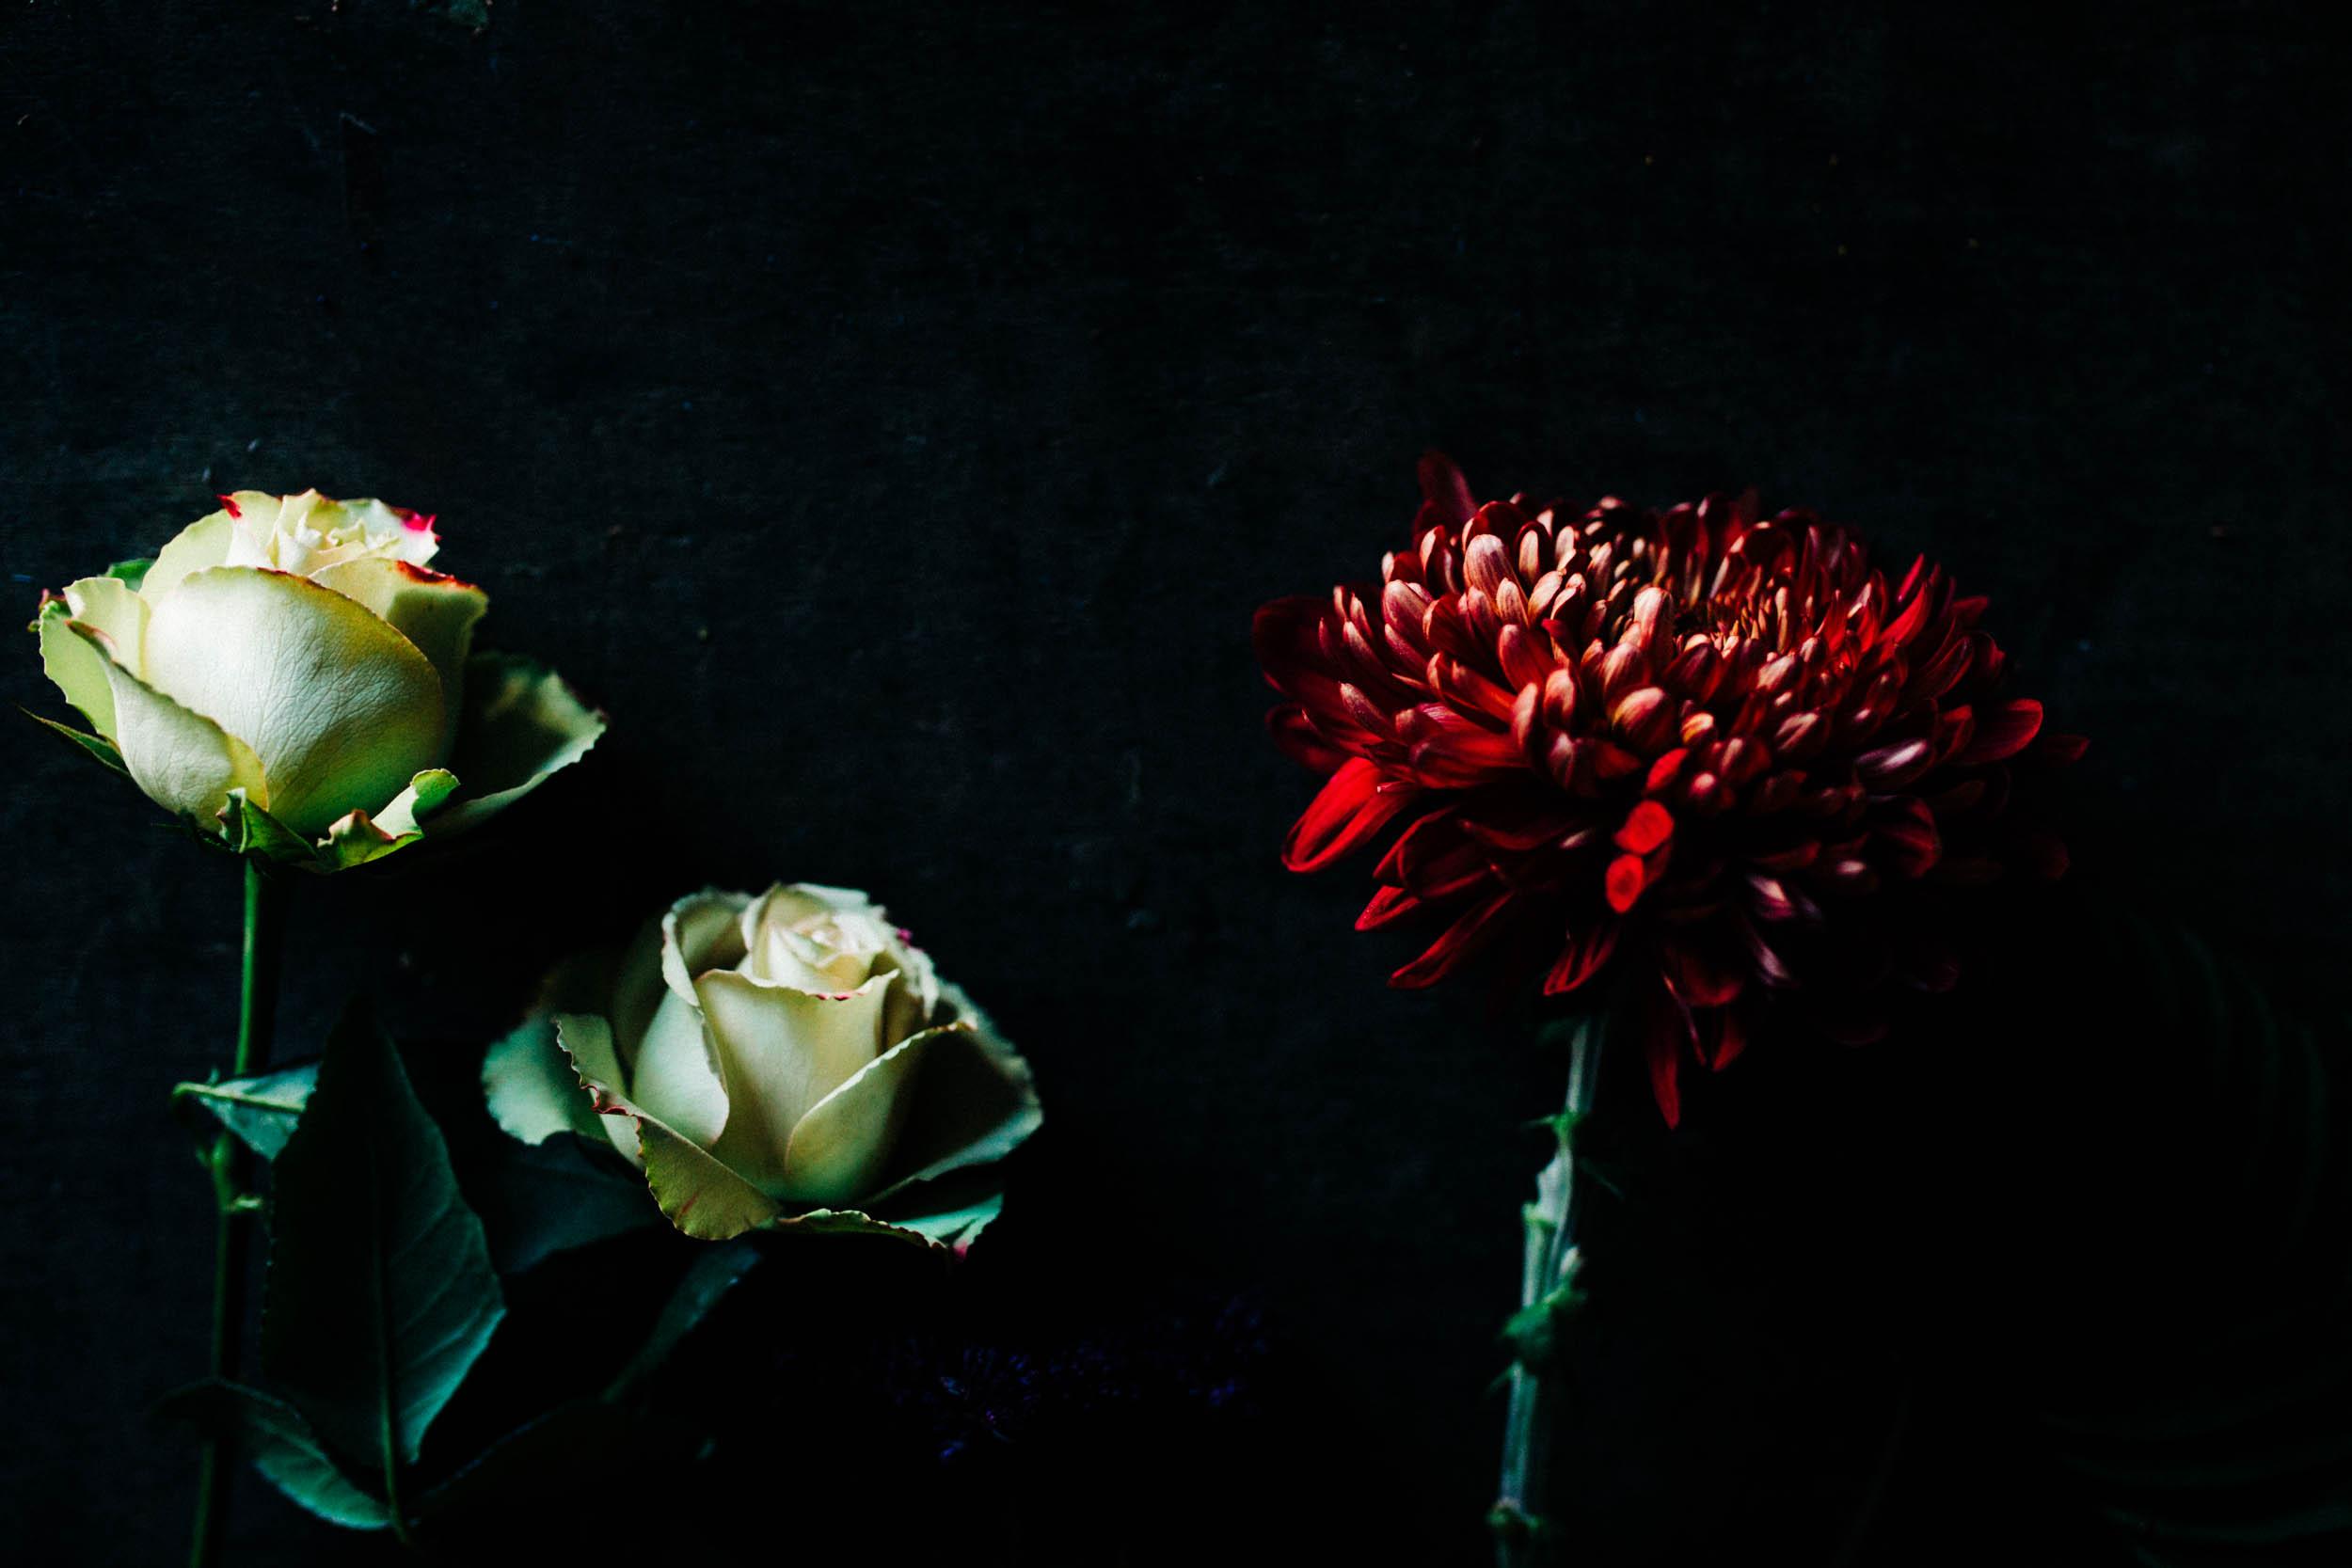 Alex_Sedgmond_Photography-Forbesfield-Cardiff_SouthWales.jpg